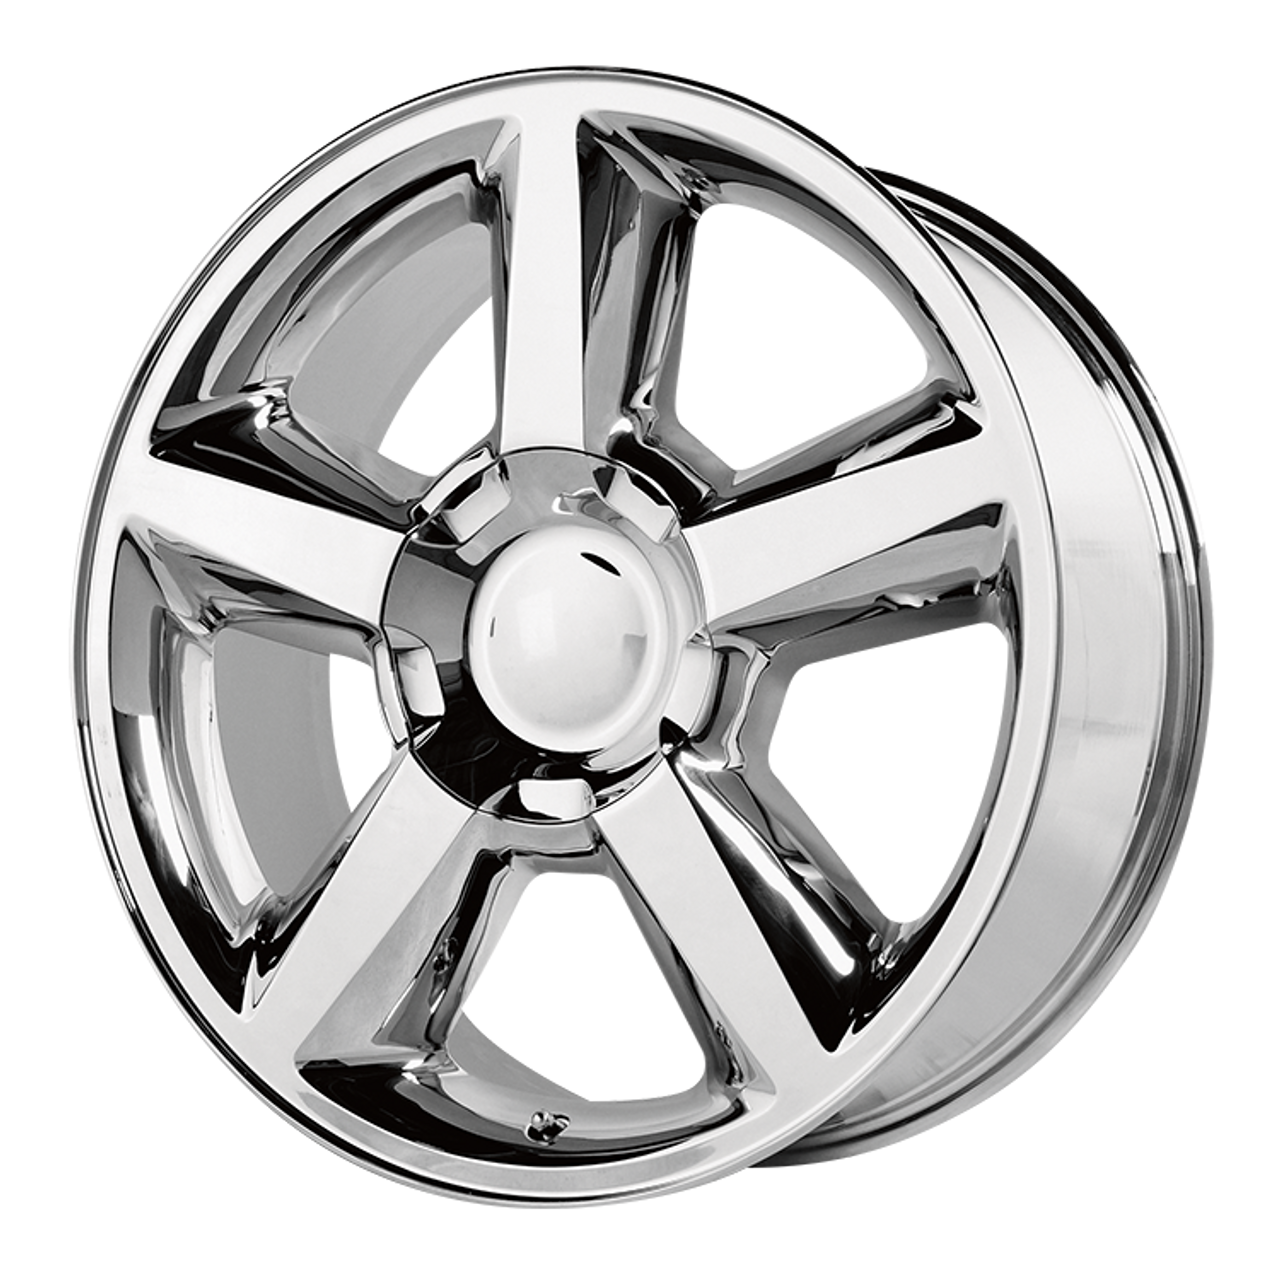 "Chrome 22"" Old Style LTZ Wheels for GMC Sierra, Yukon, Denali - New Set of 4"